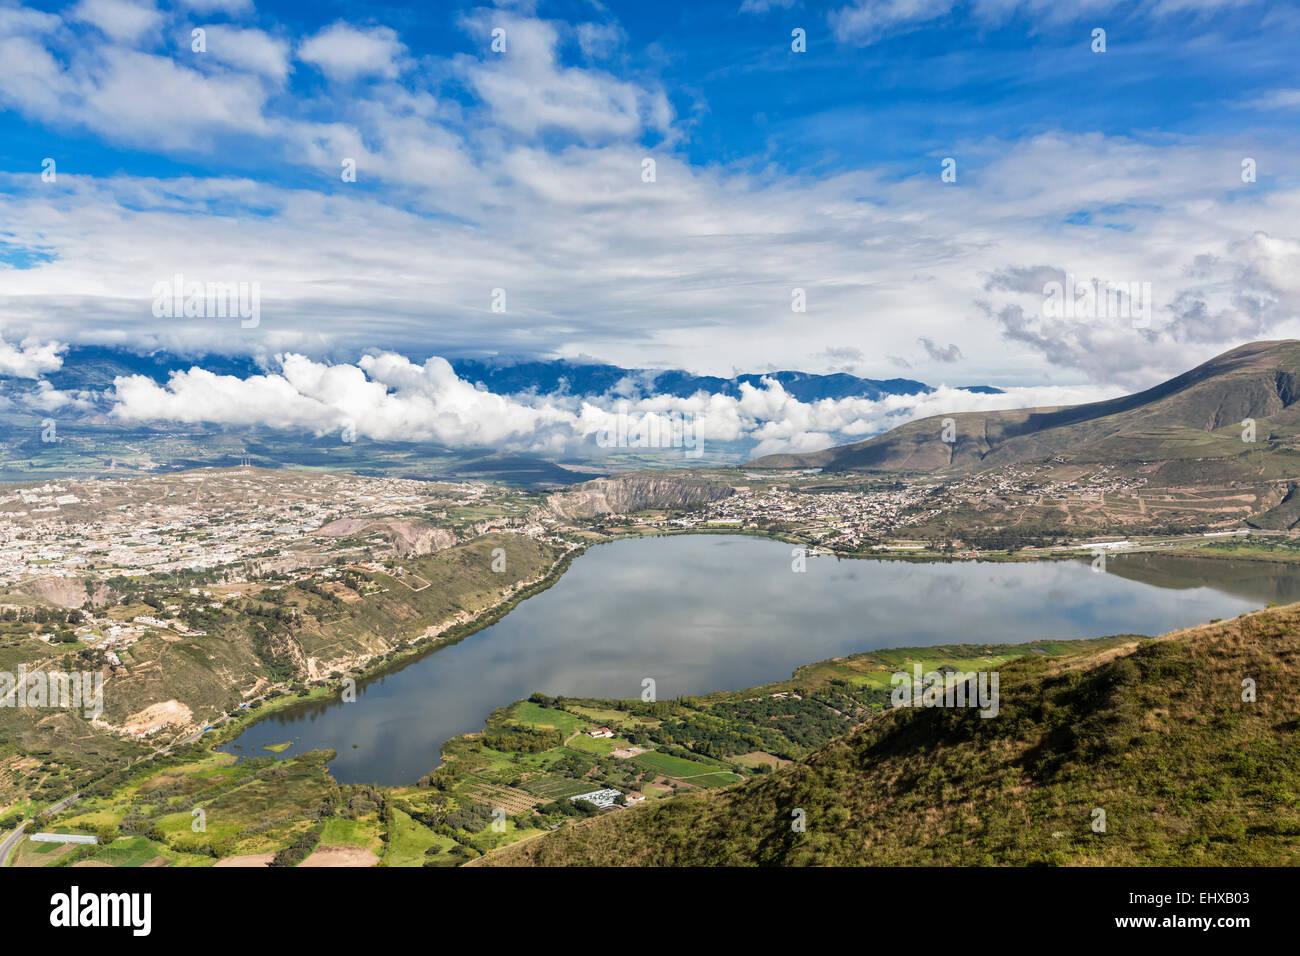 South America, Ecudador, Imbabura Province, Ibarra, View to Yahuarcocha Lake - Stock Image